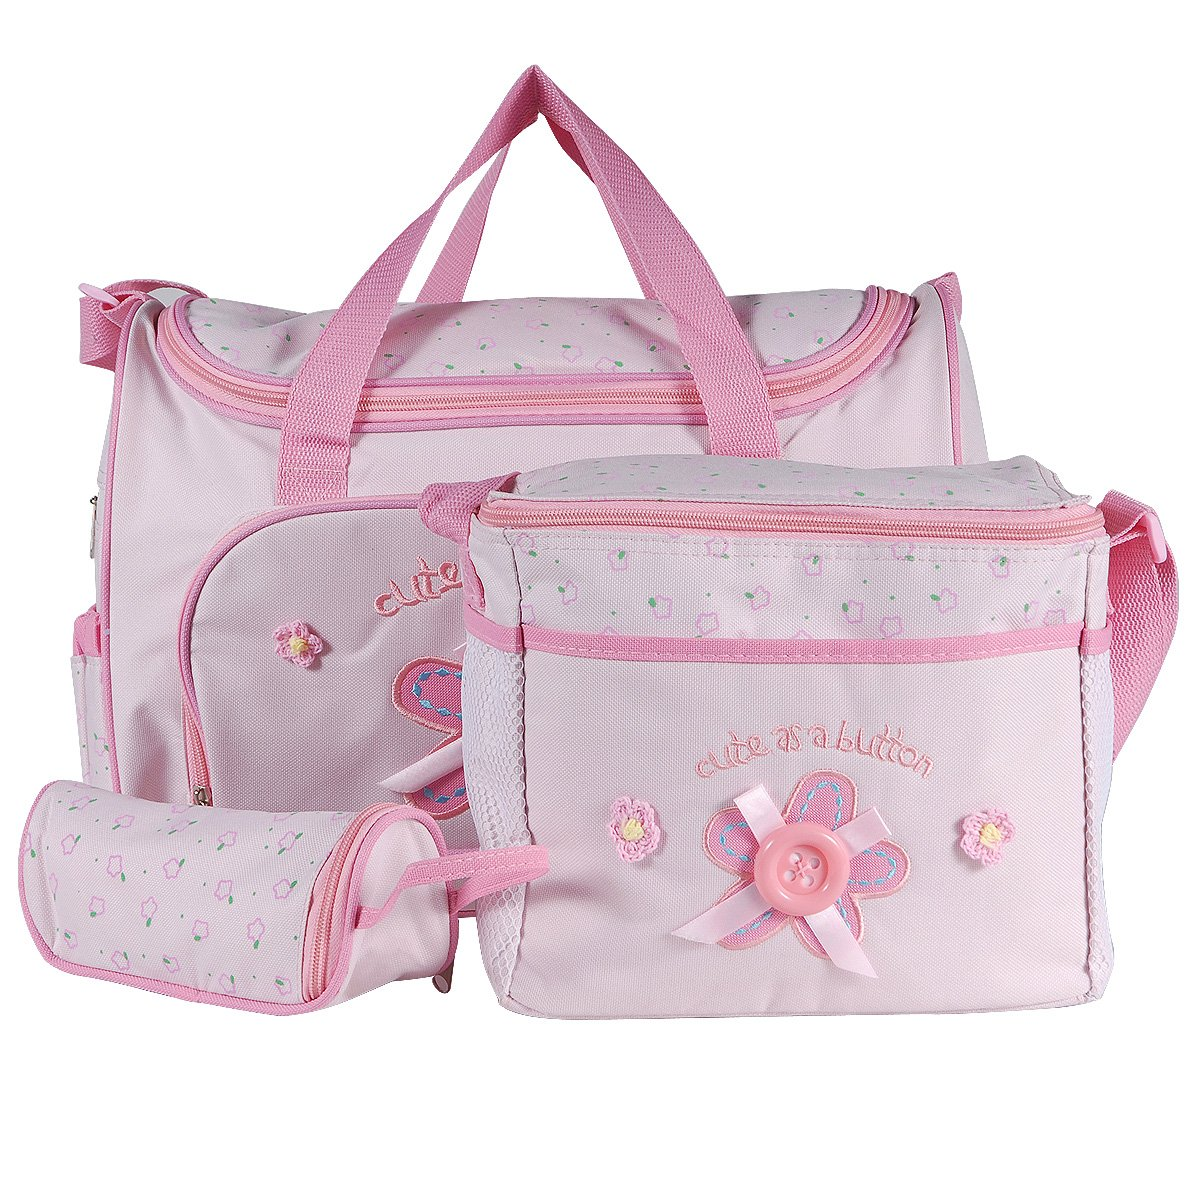 Set 4 kits Bolsa/Bolsillo/Bolso Maternal Rosado biberón carro carrito para Bebé Surepromise